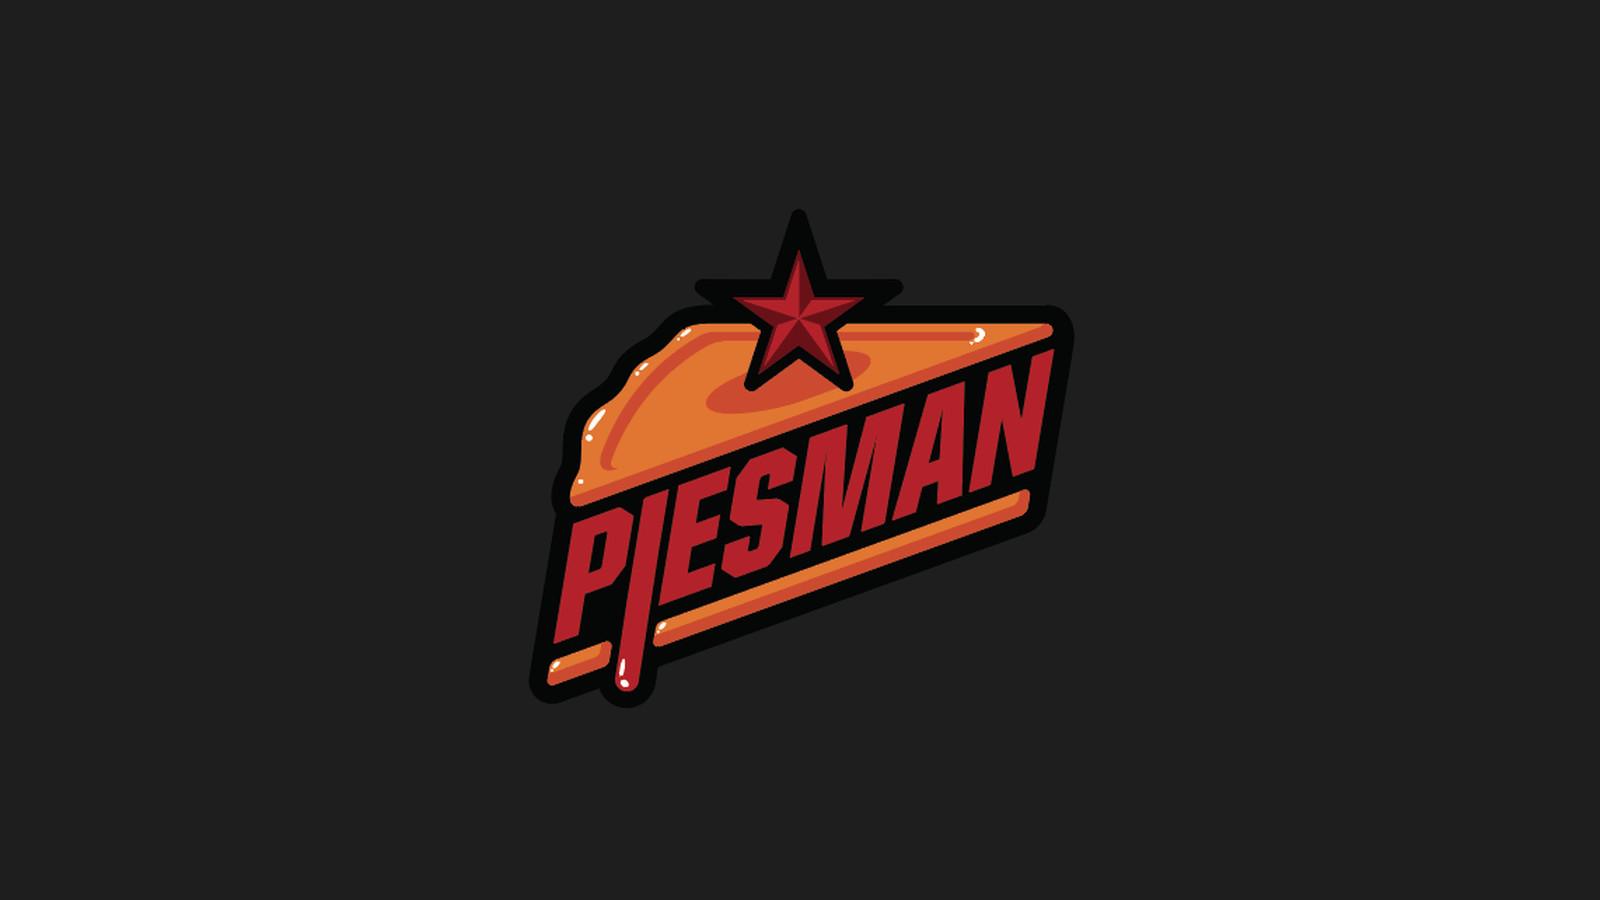 Pitt S Brian O Neill Wins 2016 Piesman Trophy Sbnation Com